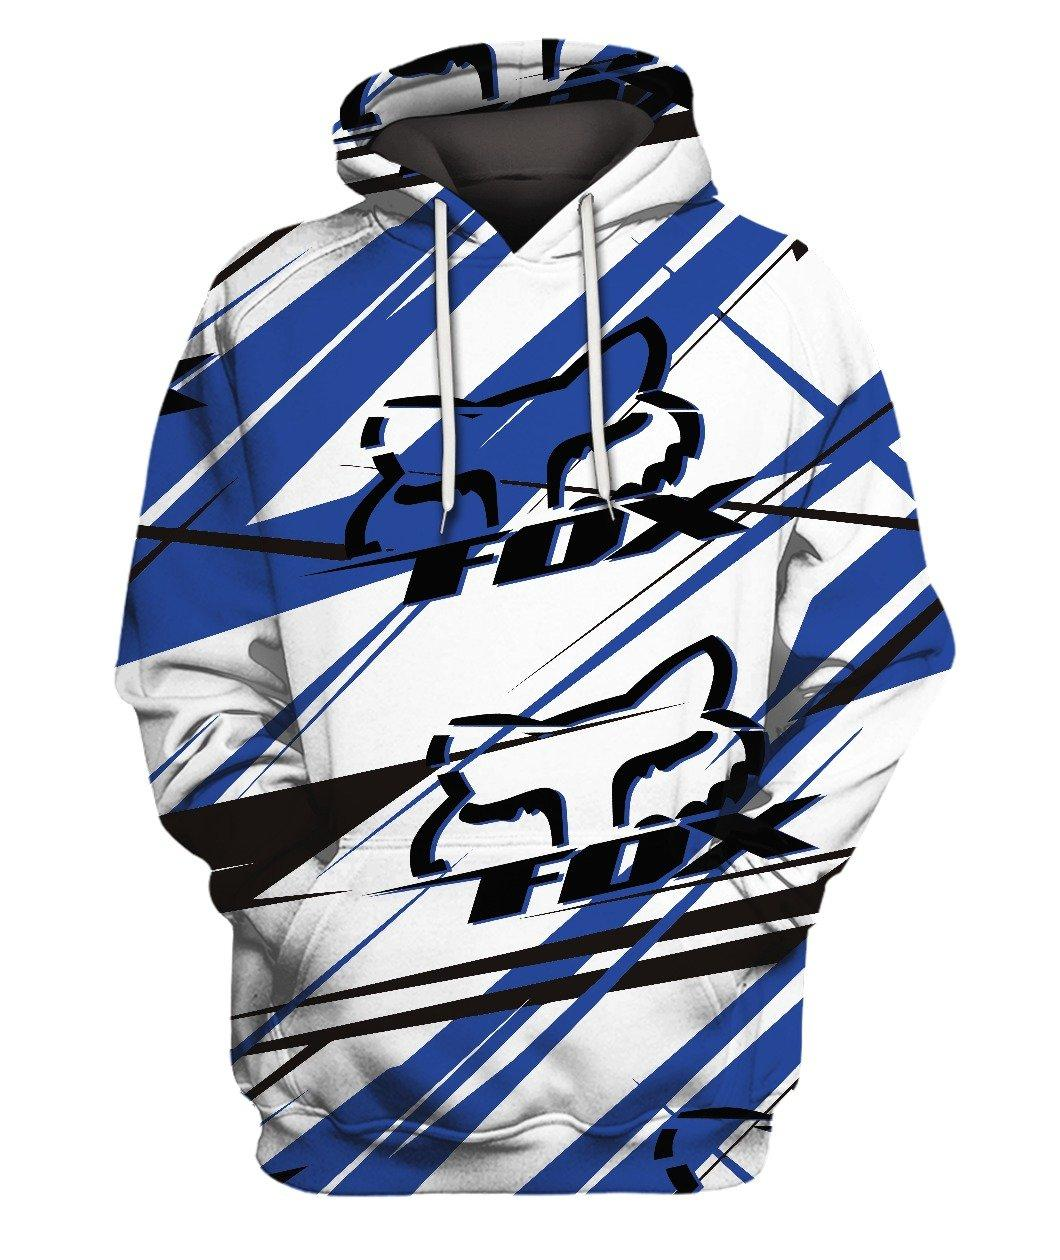 Fox Bike Blue 3d Full Print 3d Graphic Printed Tshirt Hoodie Up To 5xl